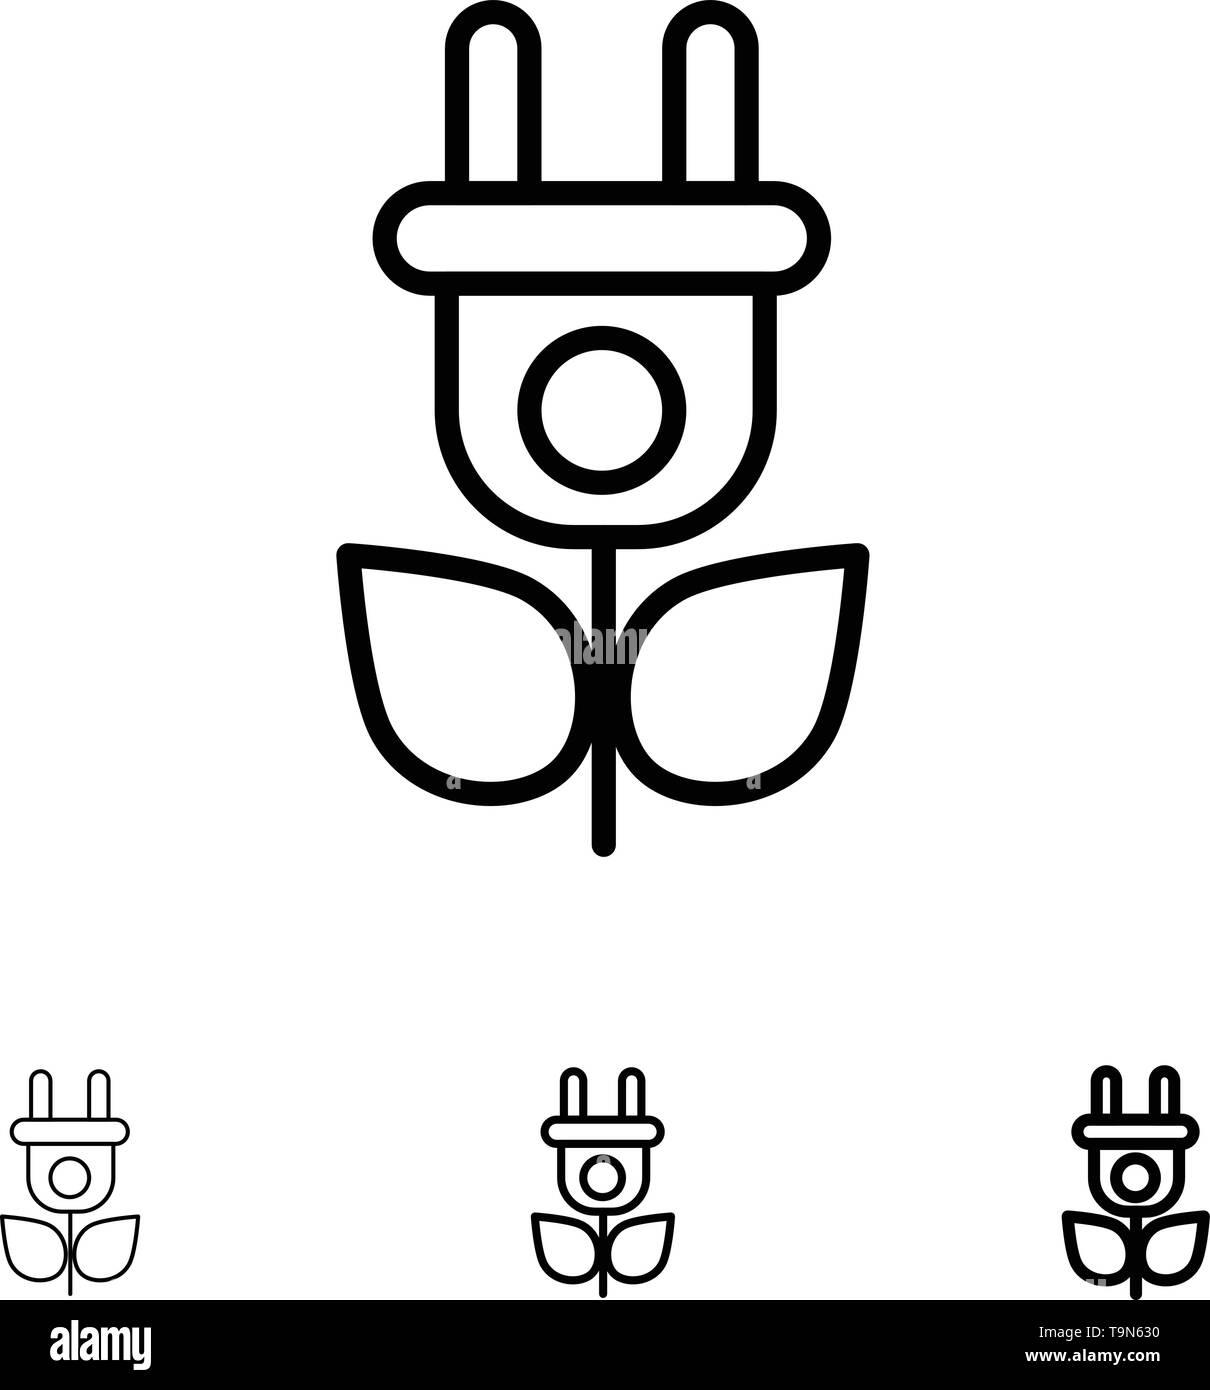 Eco, Strom, Natur Bold und dünne schwarze Linie Icon Set Stockbild